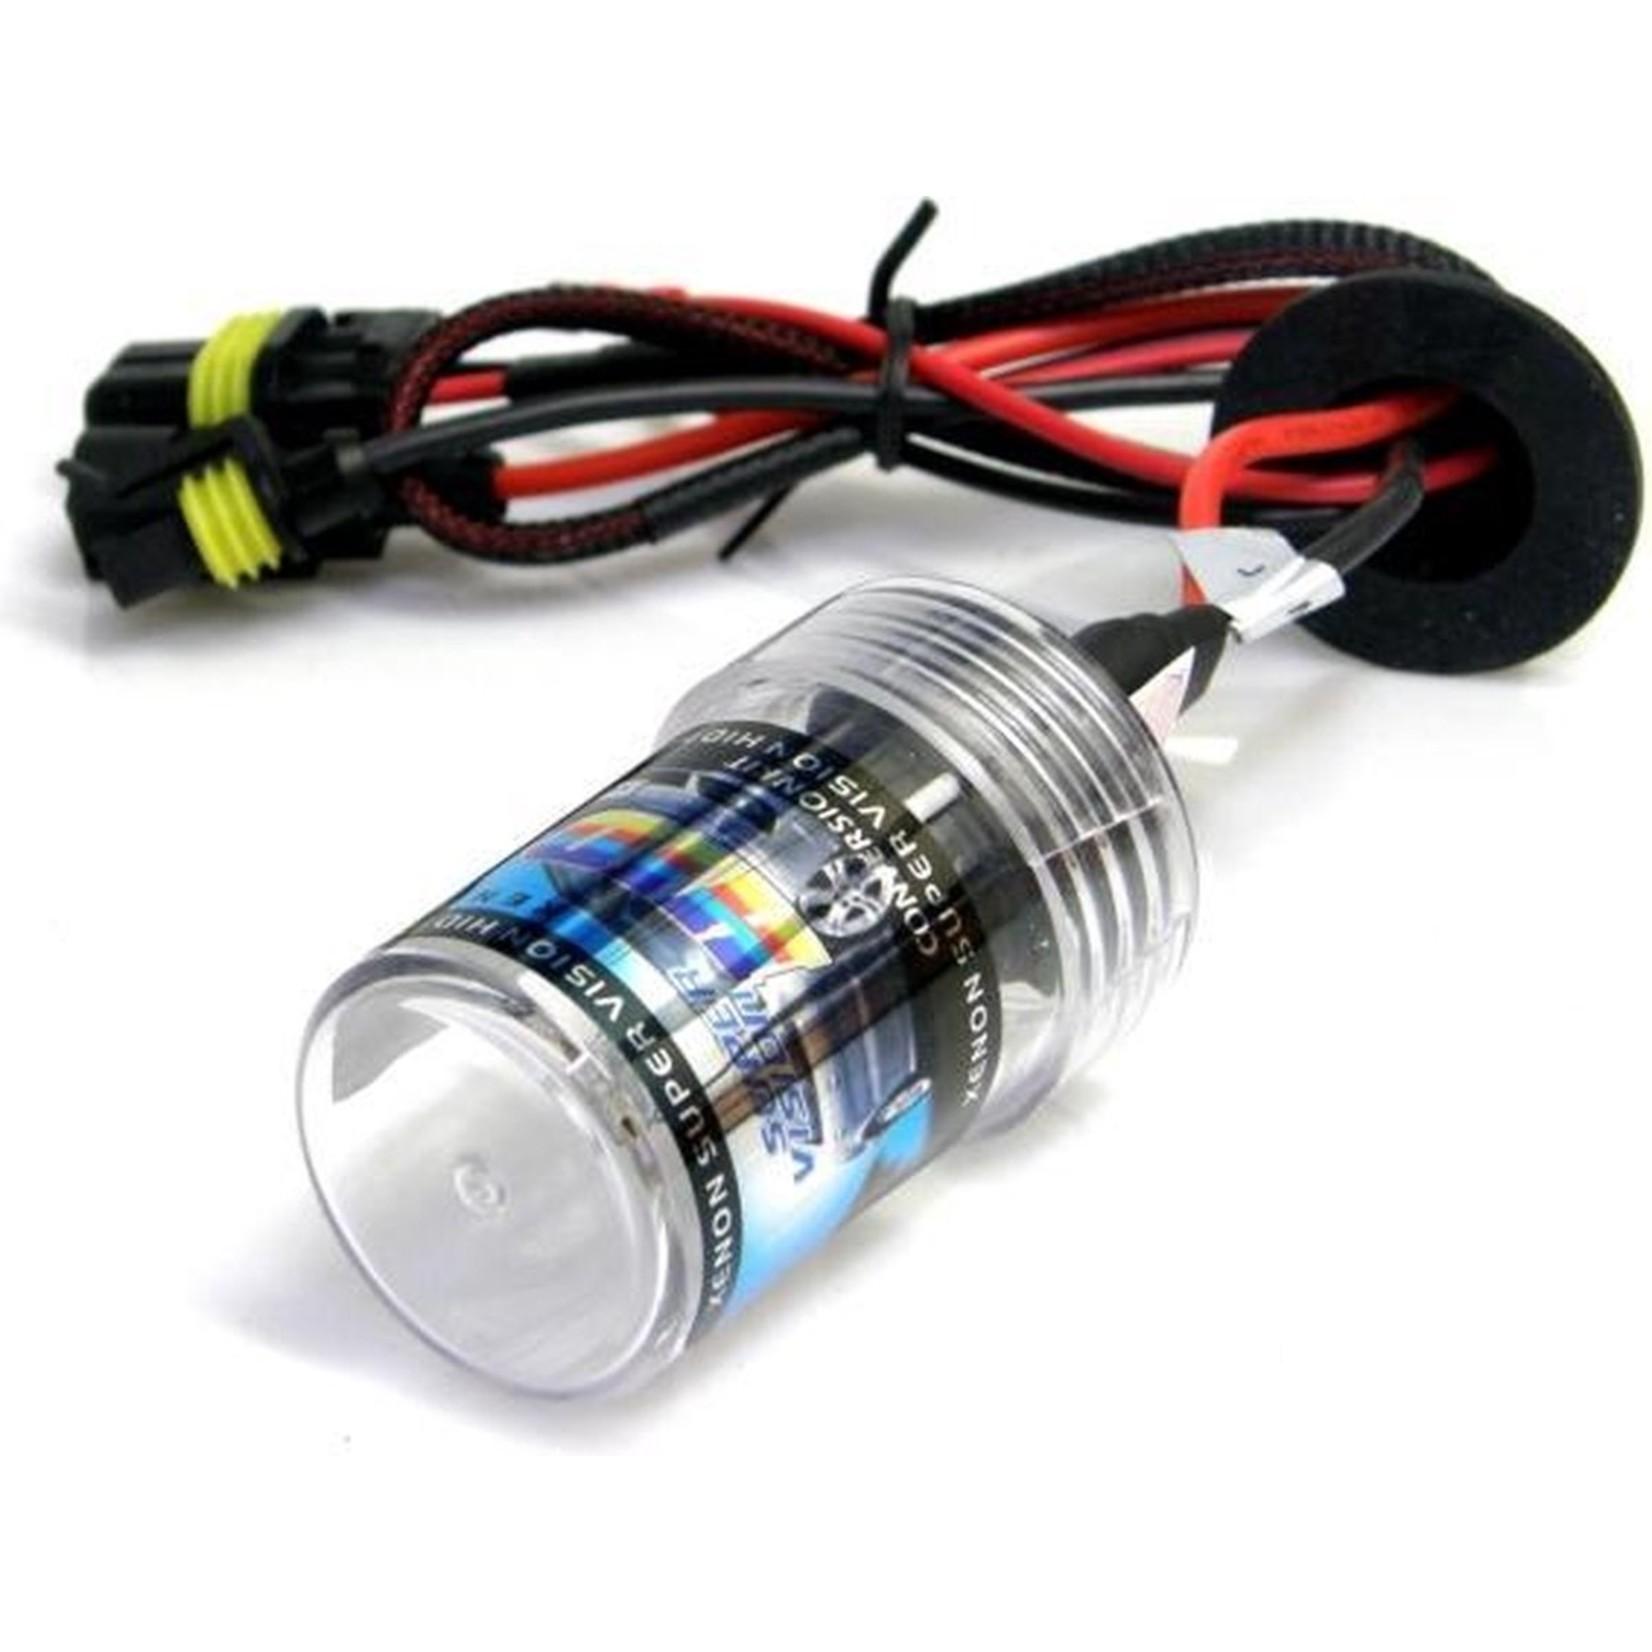 XEOD H7R Xenon vervangingslamp